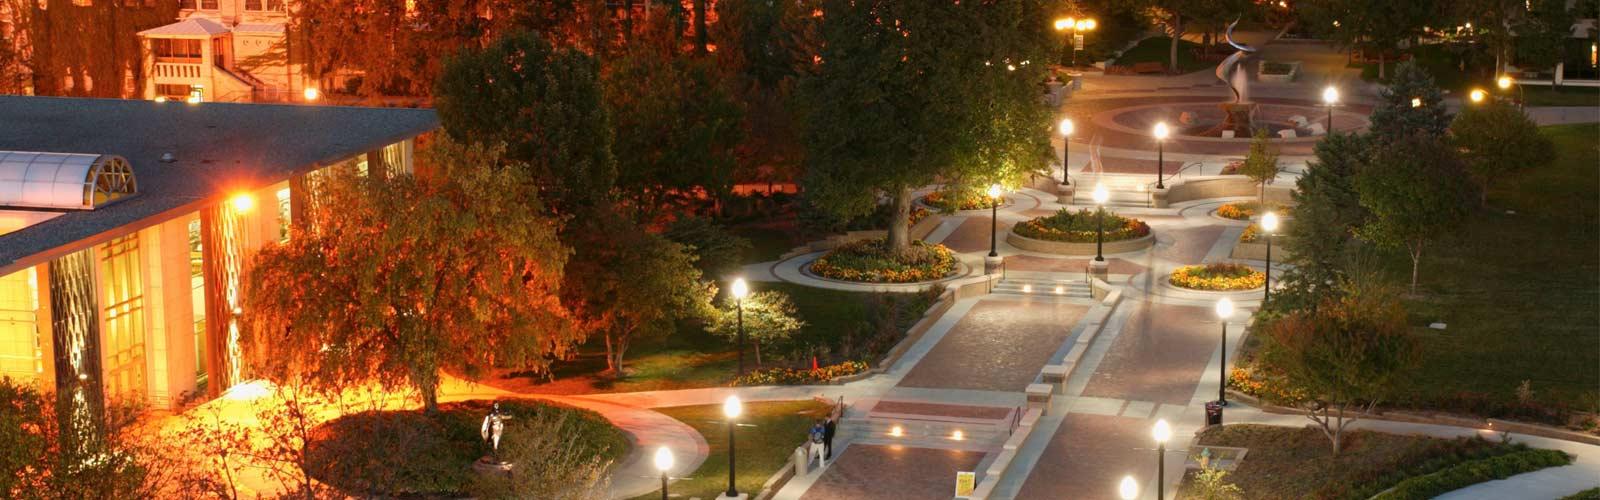 Creighton Campus mall at night